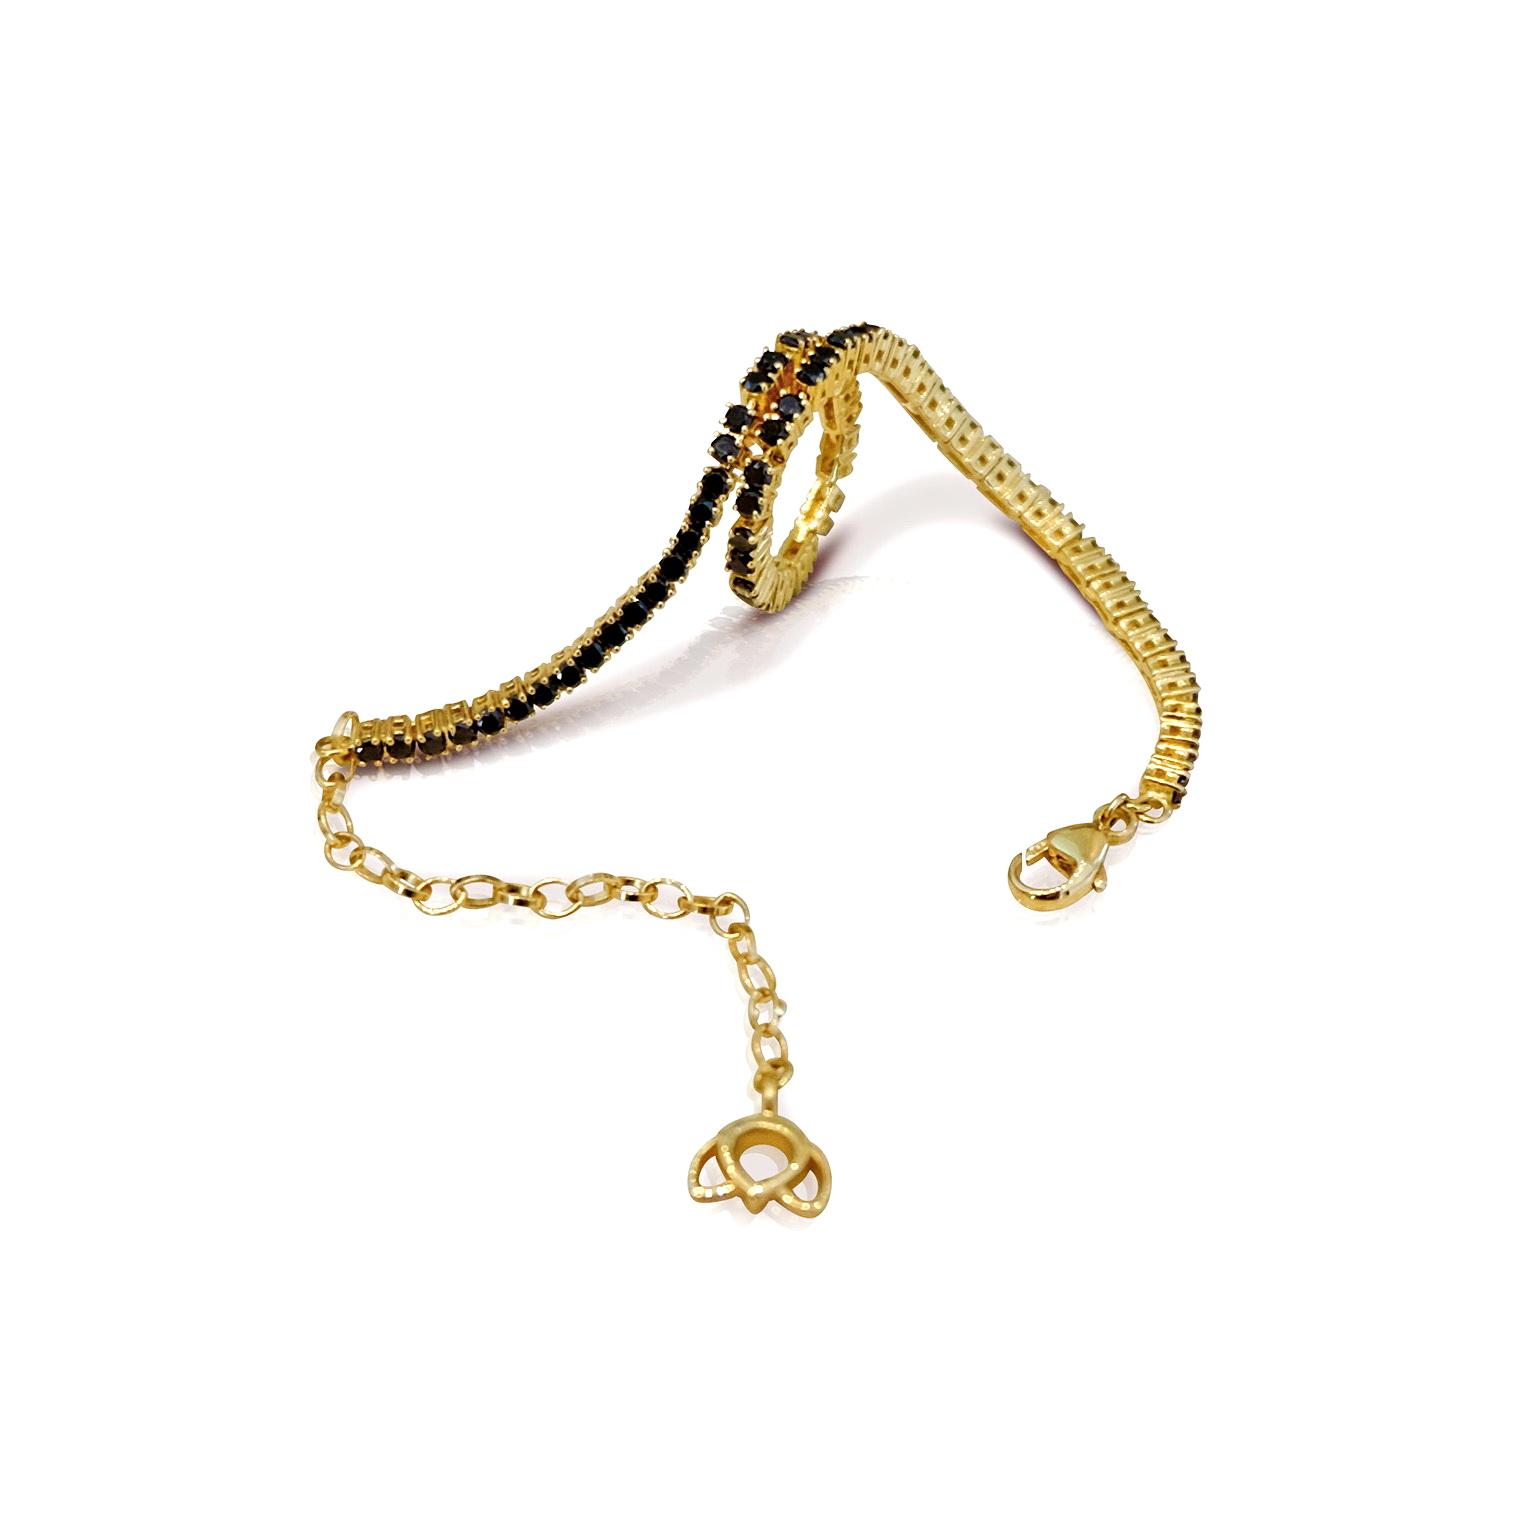 'Little Luca' 18 Carat Yellow Gold & Black Diamond Lotus Bracelet